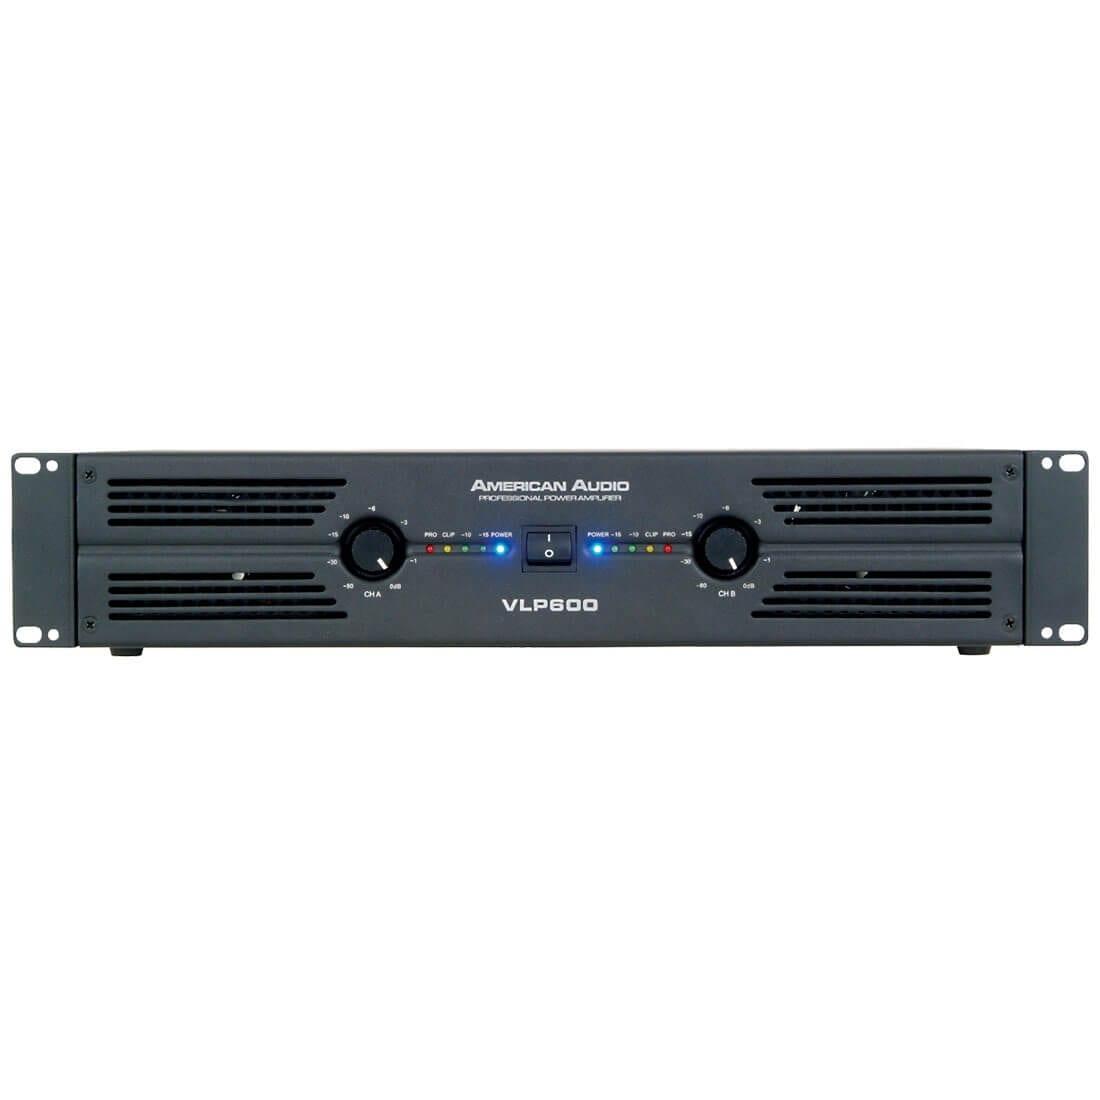 American Audio VLP600 Power Amplifier